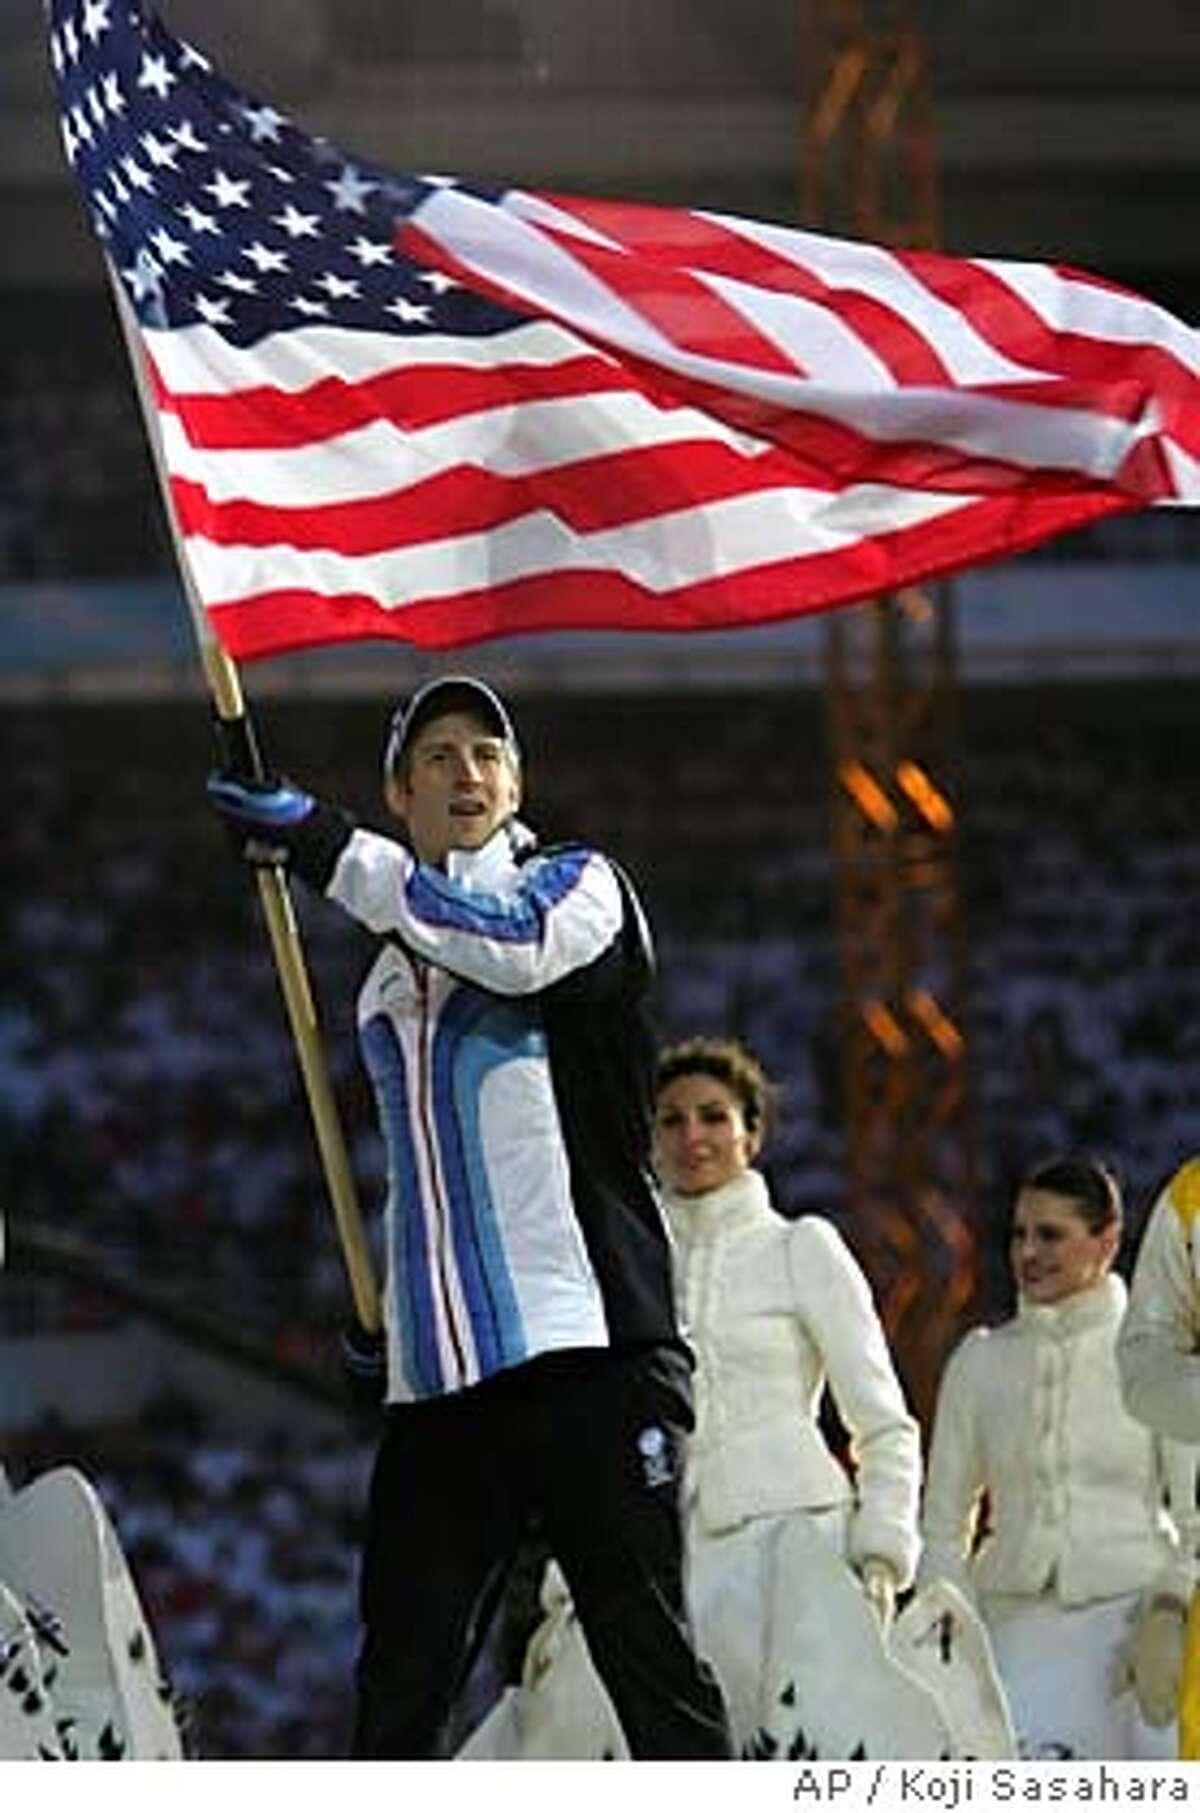 United States speedskater Joey Cheek holds an American national flag during the Winter Olympics closing cermeony in Turin, Italy, Sunday, Feb. 26, 2006. (AP / Koji Sasahara)